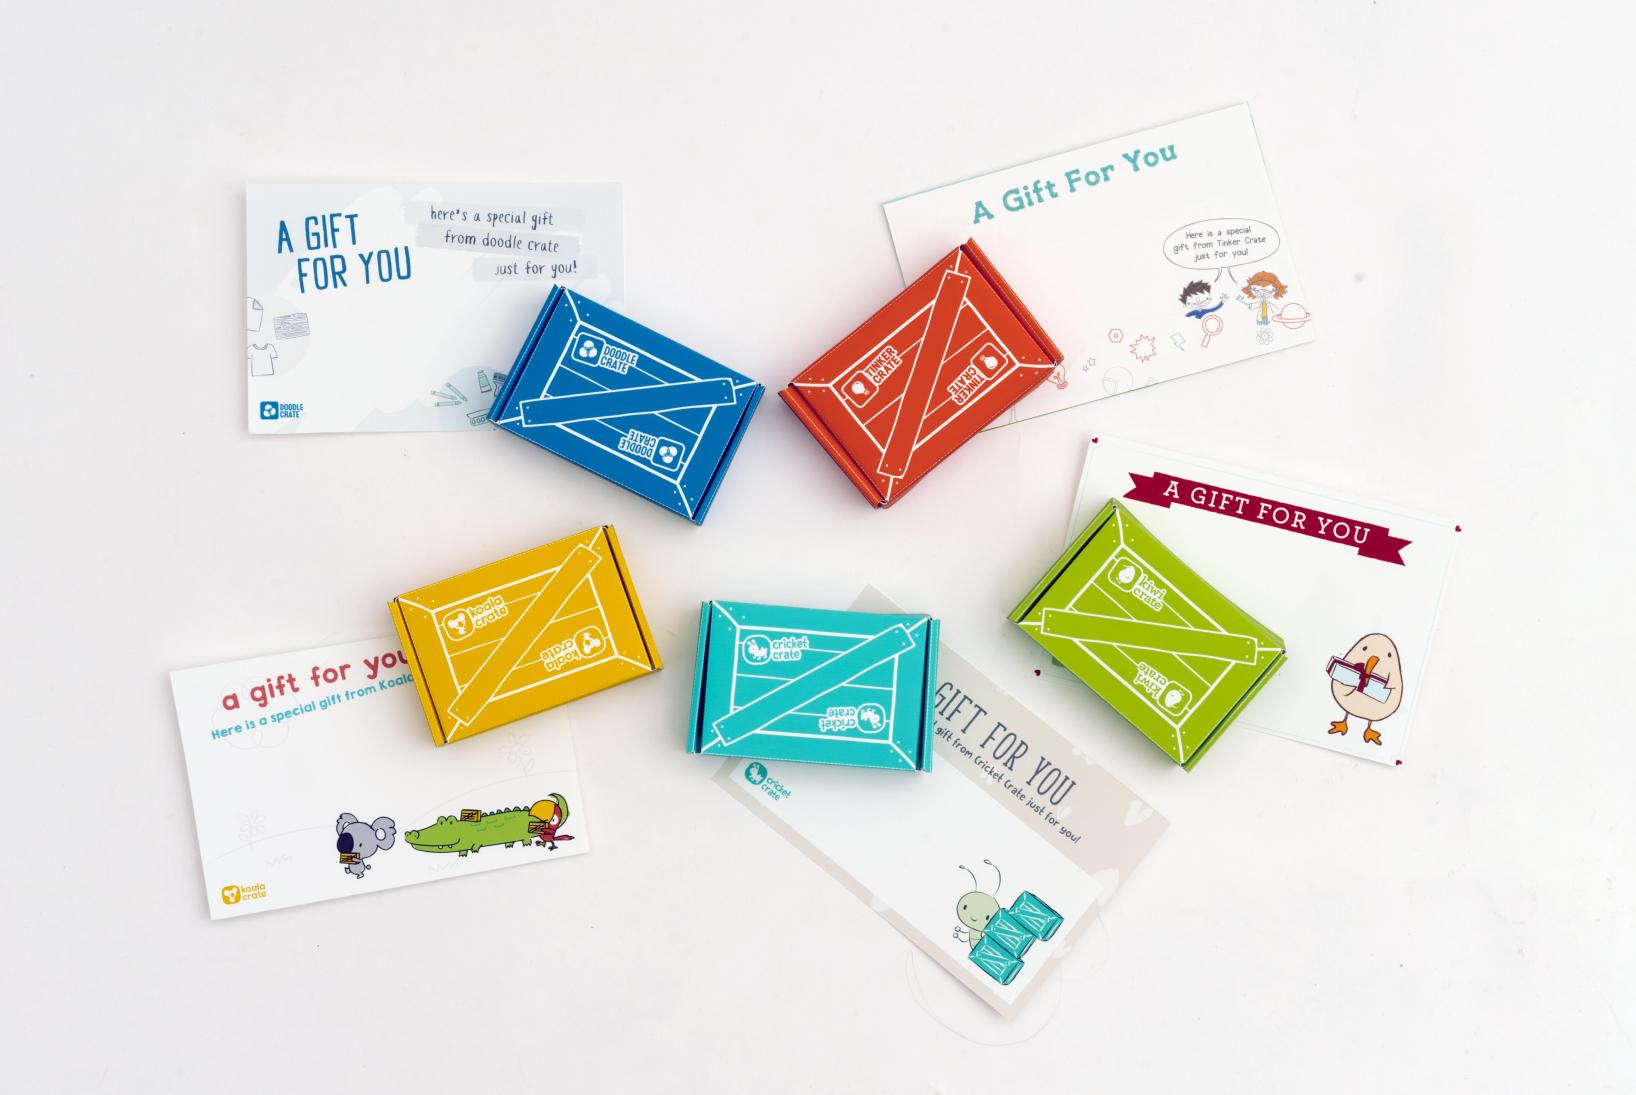 mini-crate-printable-kiwi-crate-gift-subscription